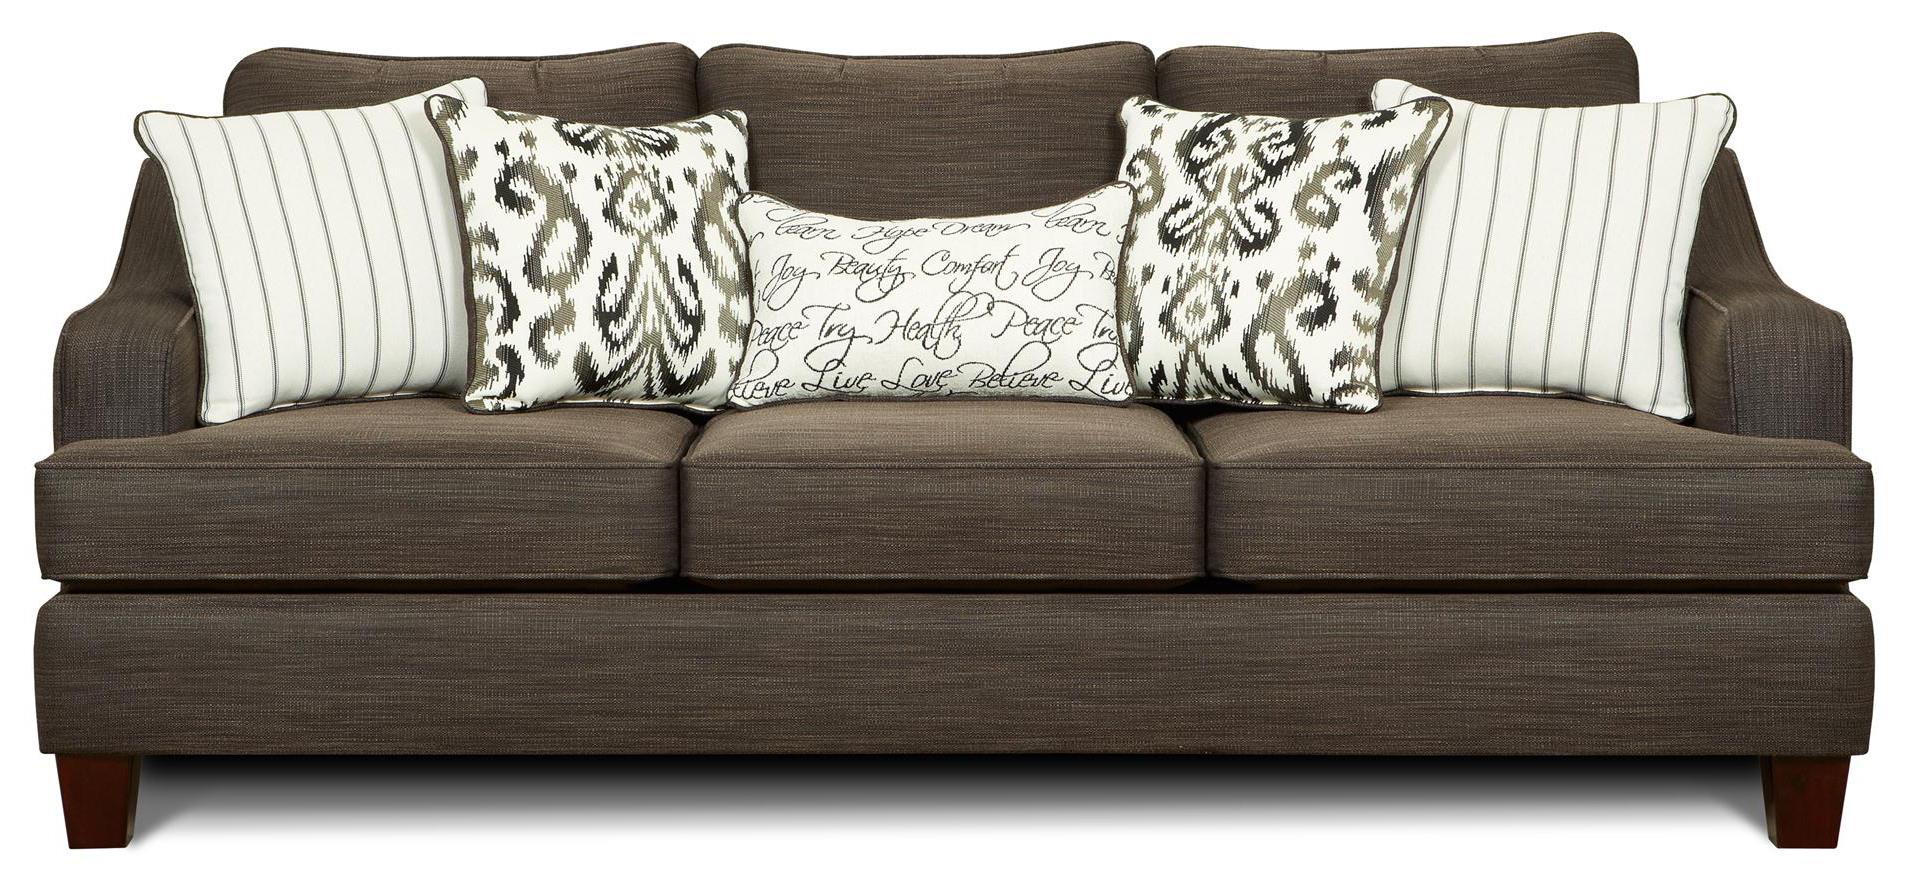 Fusion Furniture Imagine Sofa - Item Number: 2310-KP-OdinPewter